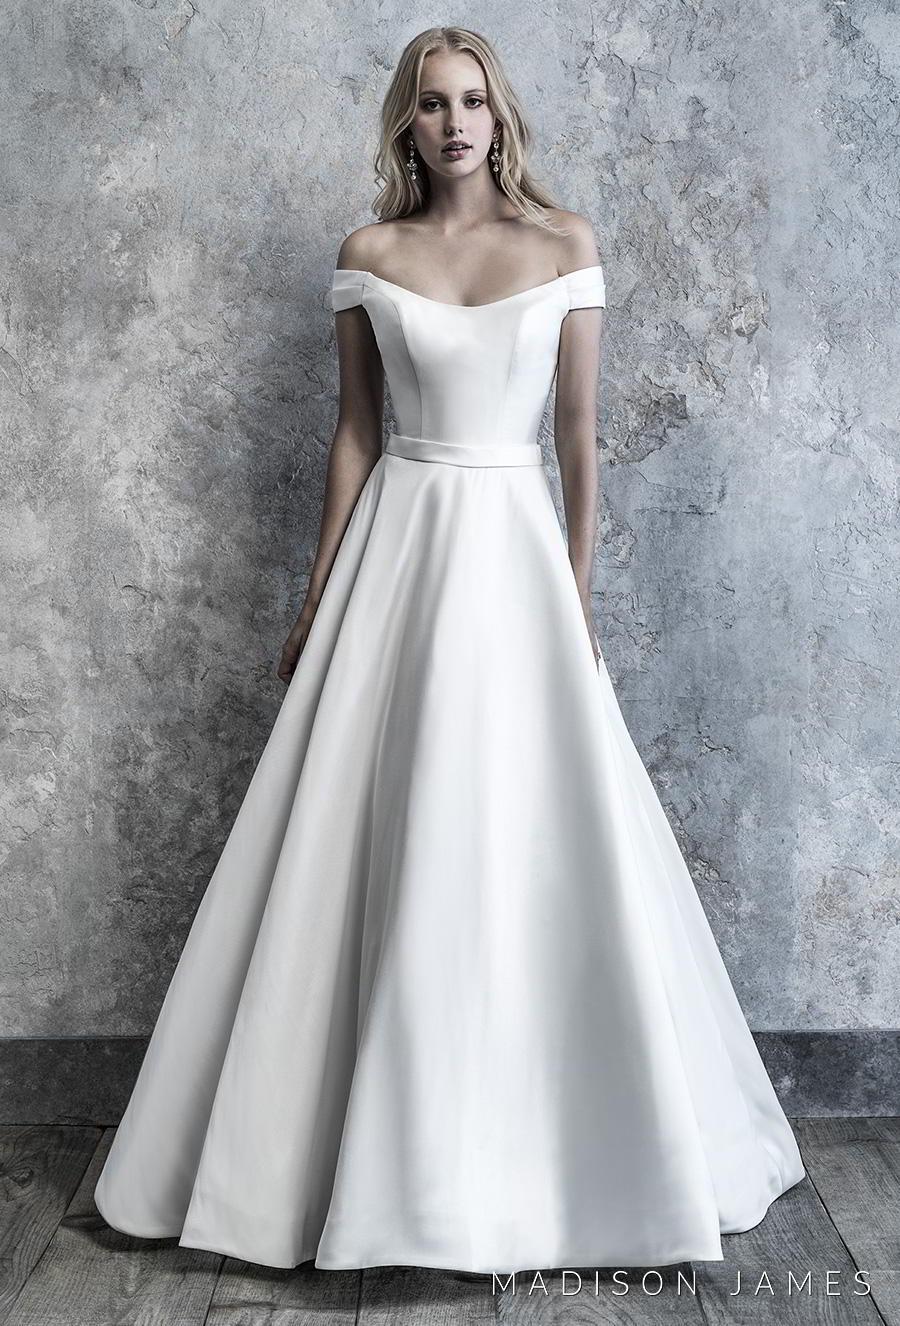 madison james 2019 bridal off the shoulder semi scoop neckline simple minimalist elegant princess a line wedding dress mid back chapel train (513) mv